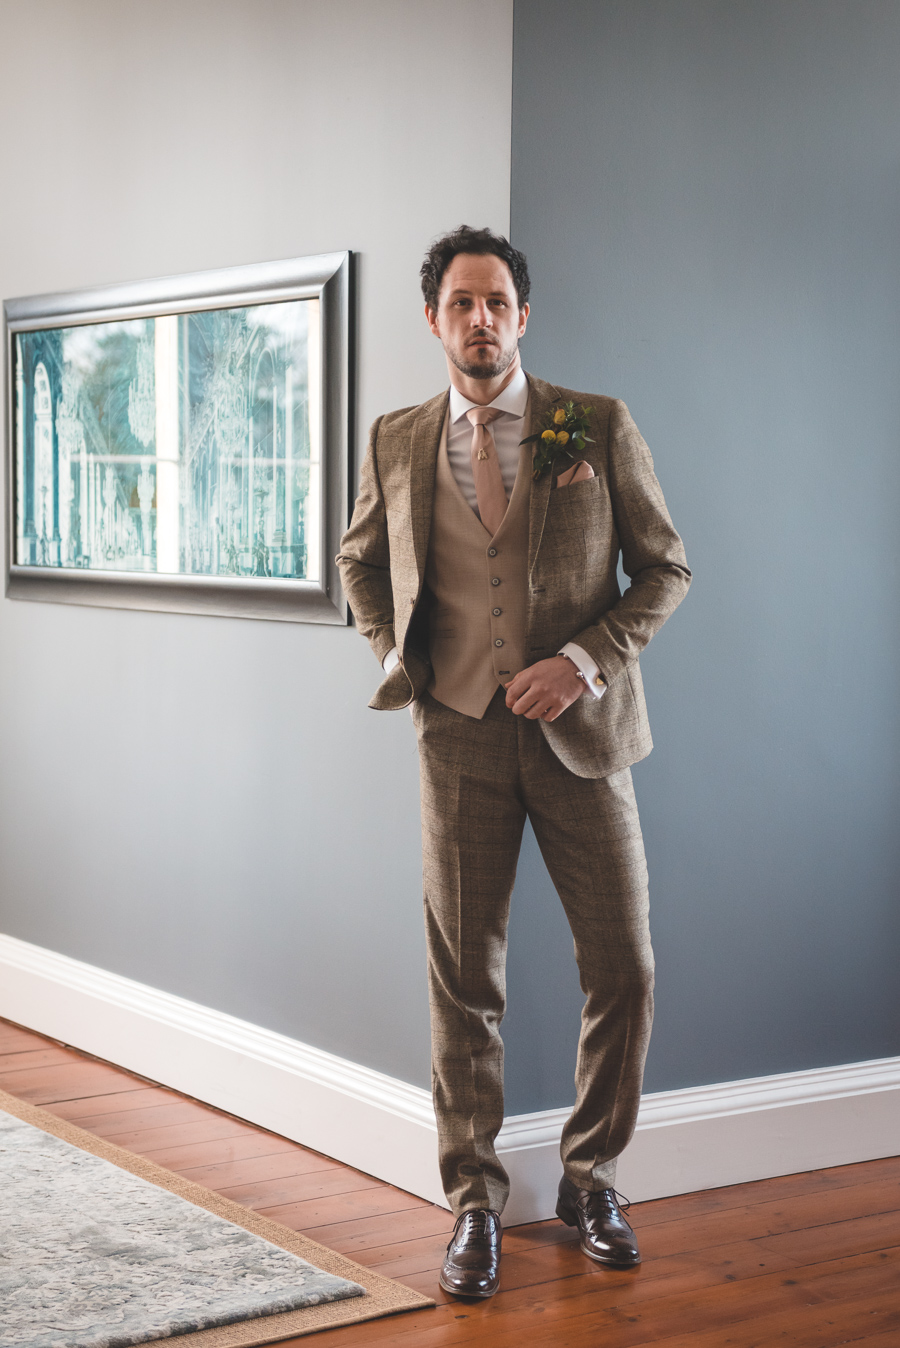 Yorkshire wedding venue styling ideas, photo credit Boho Chic Weddings (25)